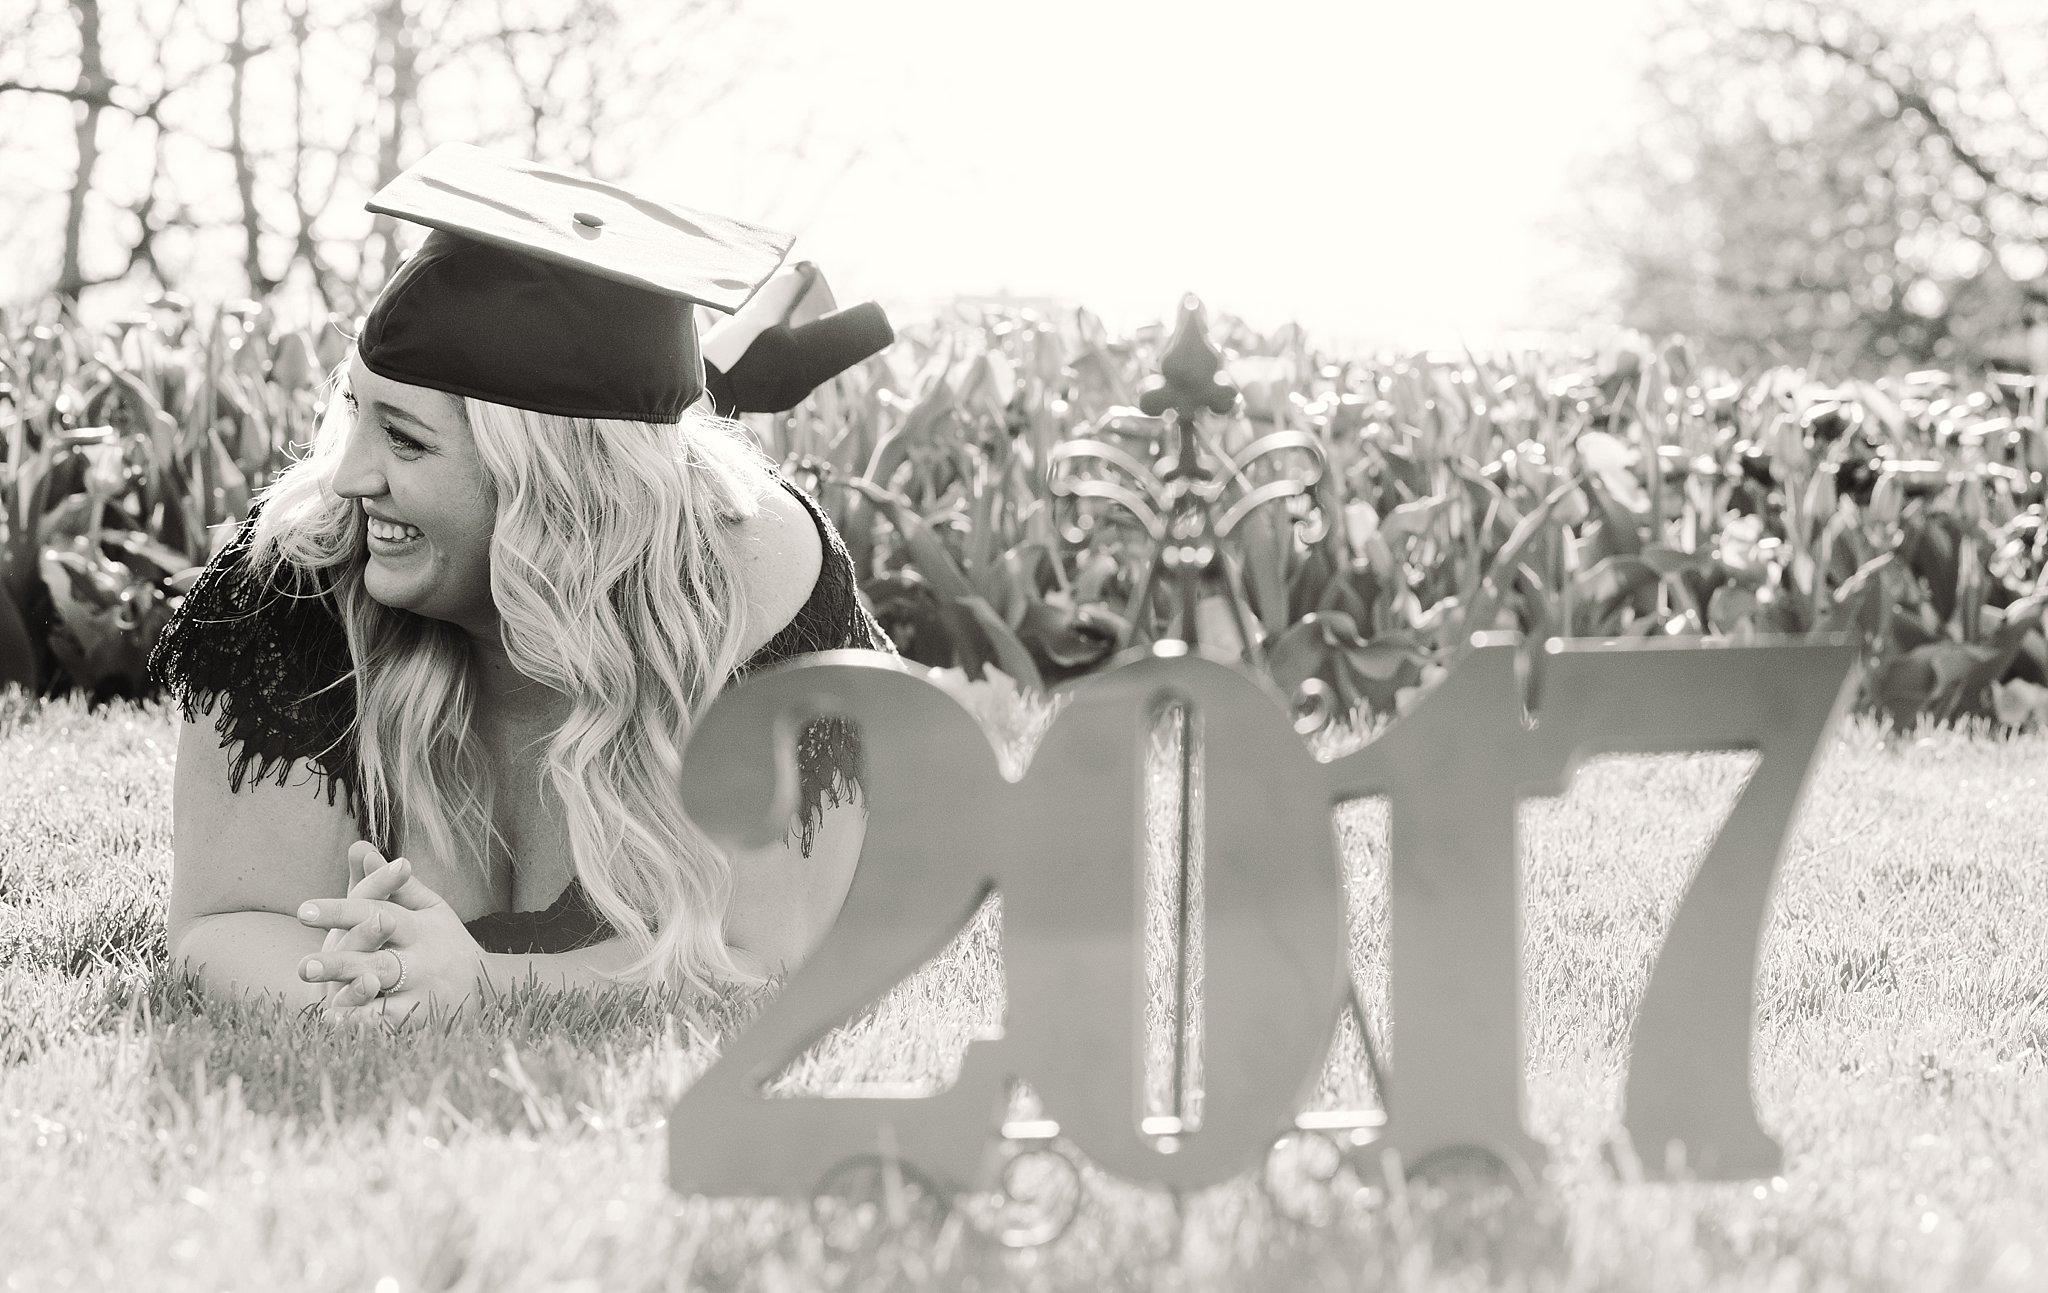 Salt Lake City,graduation photos,hilary gardiner photography,senior session,university of utah,